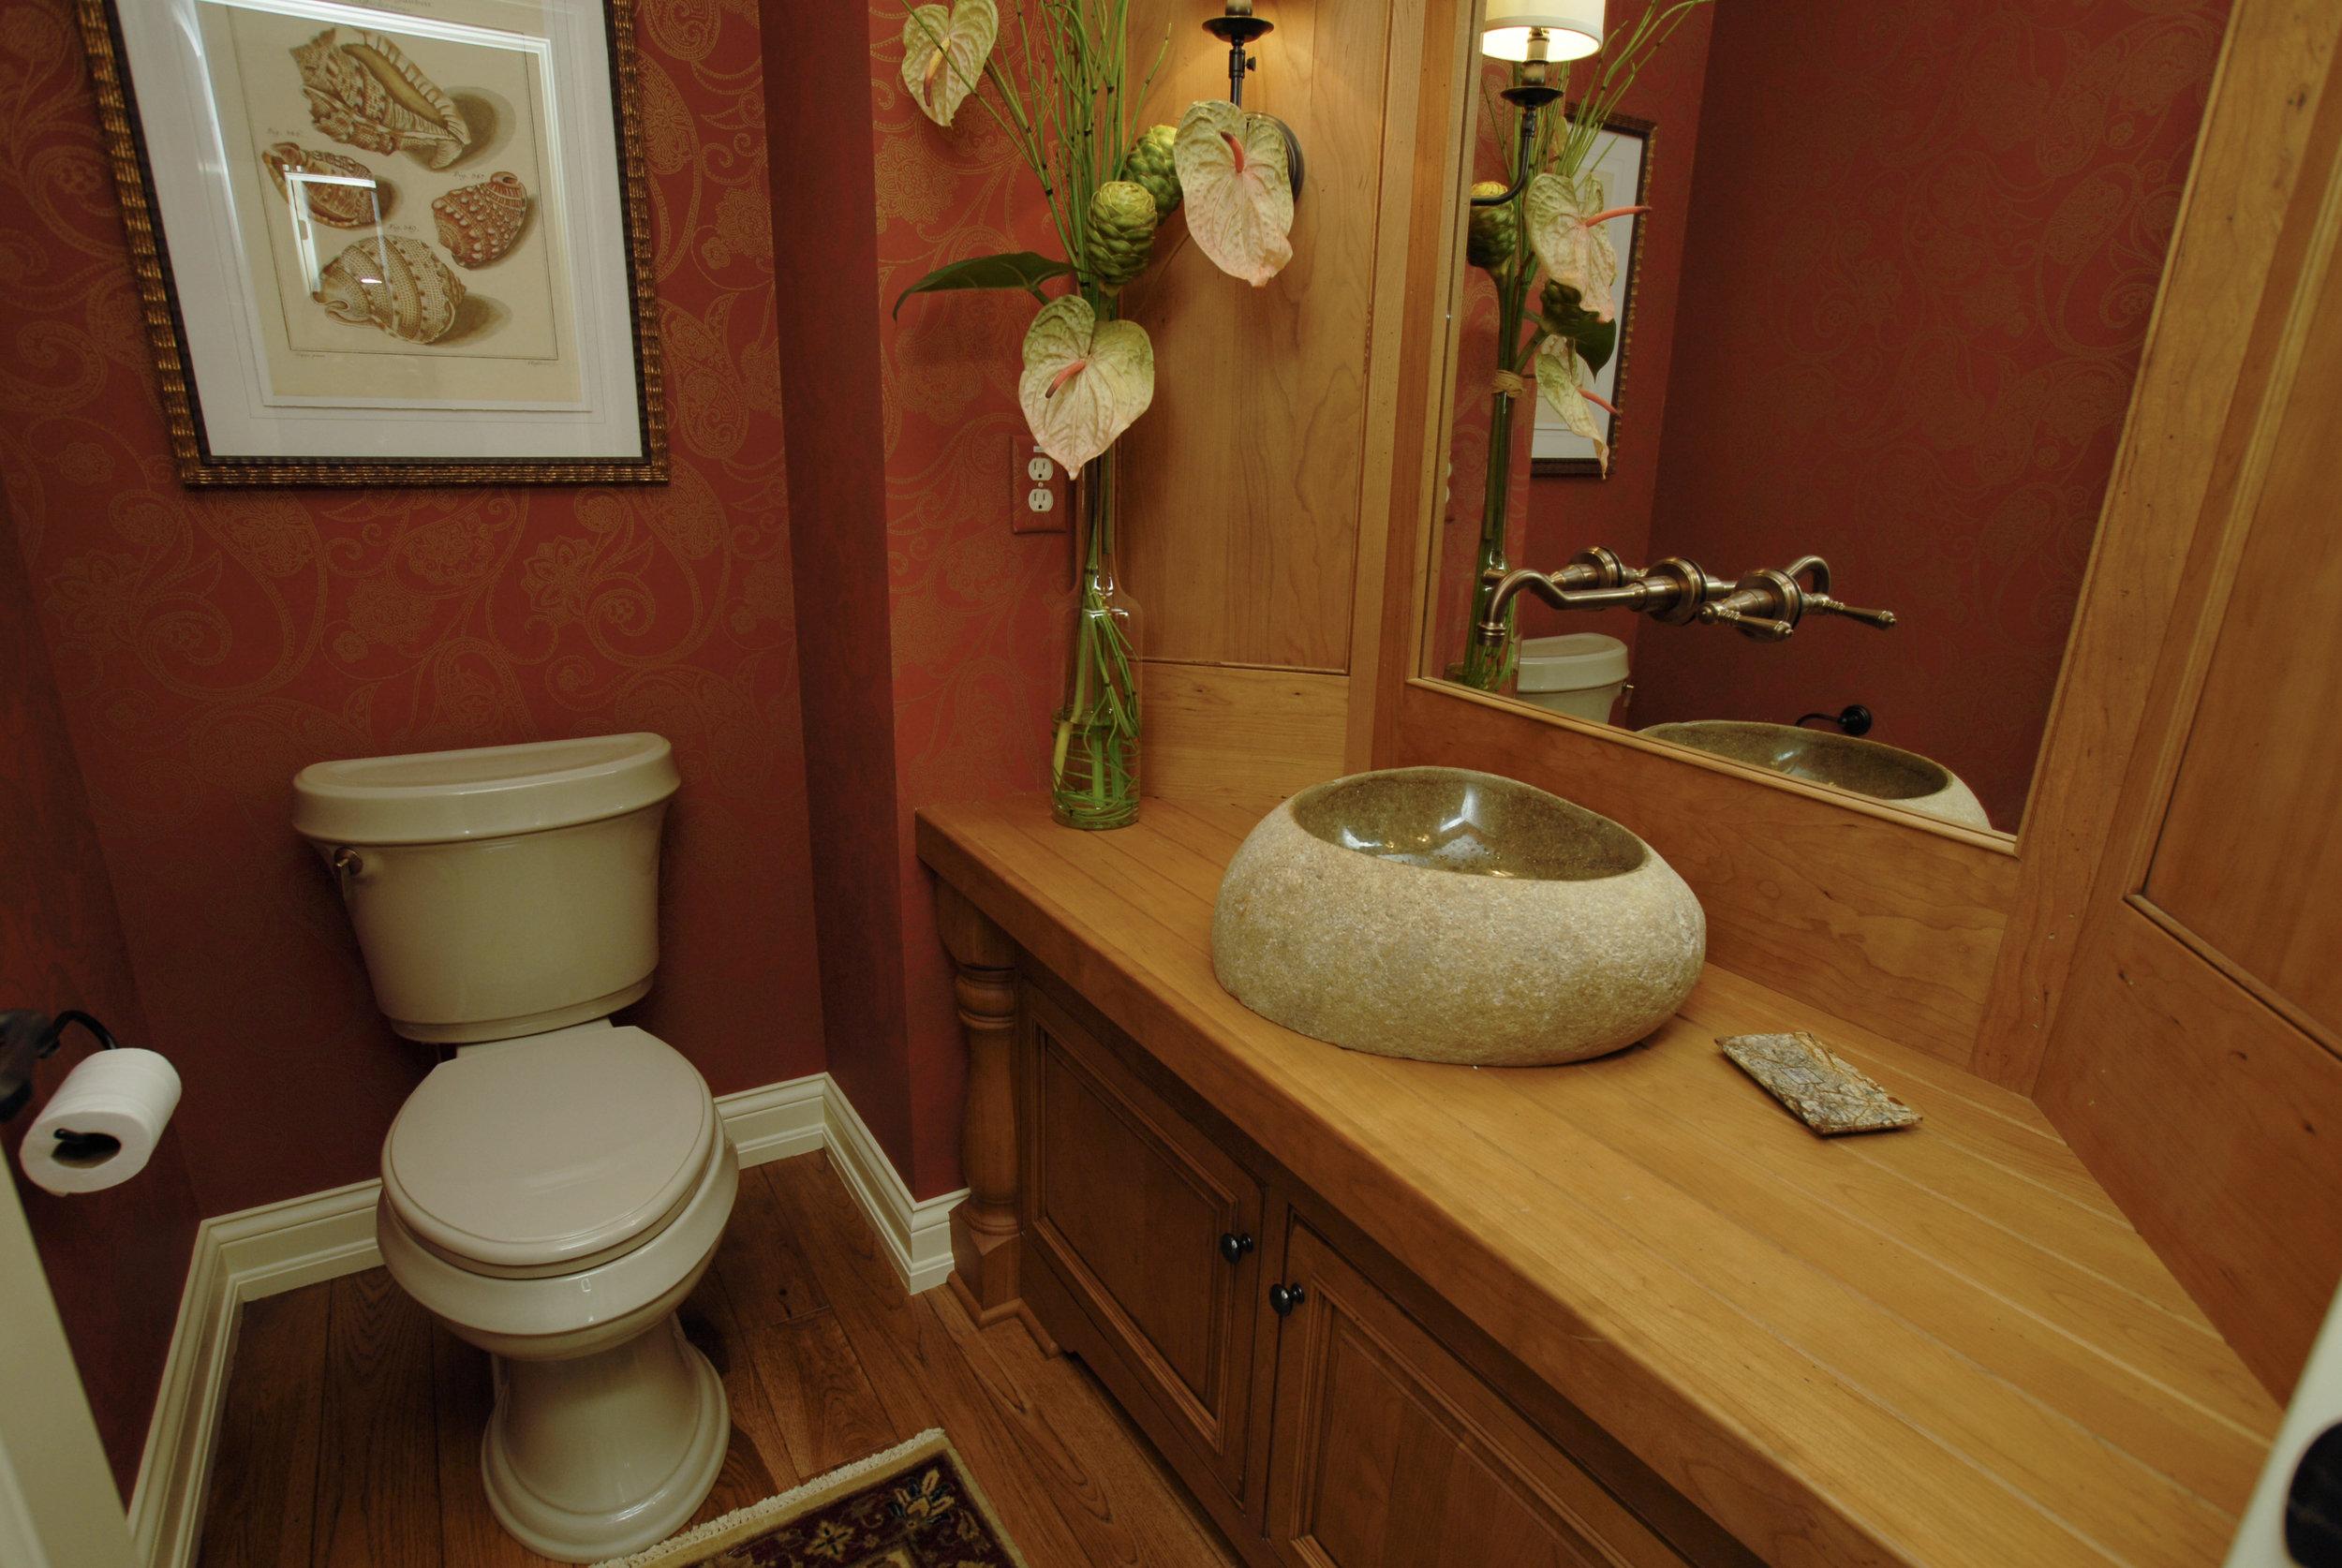 Ascent - The Talus - Bathrooms_7.jpg